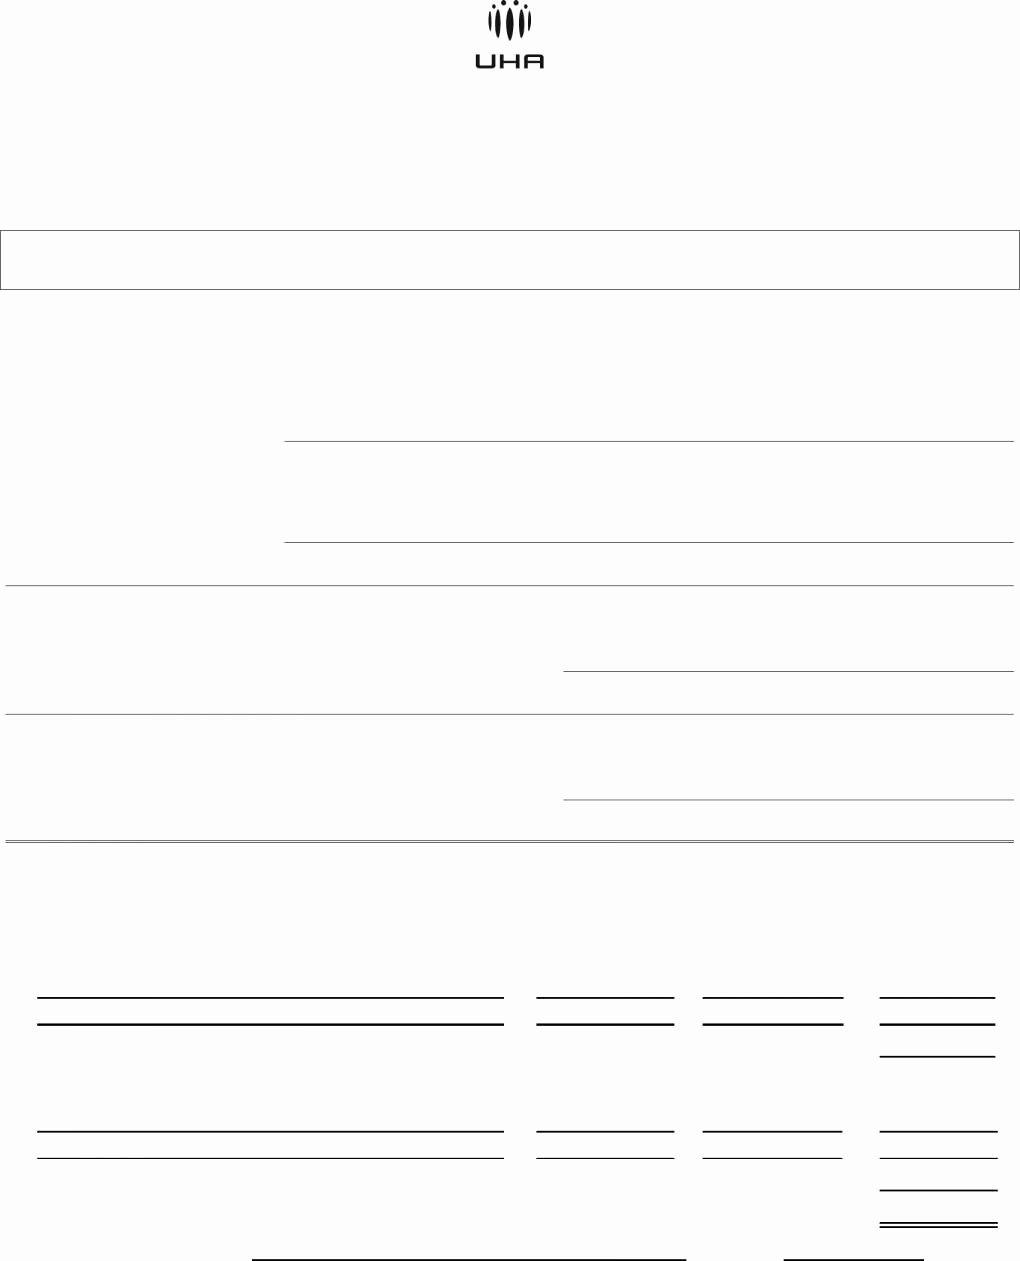 Free Billing Statement Template Luxury Free Billing Statement Template Sample Worksheets Excel